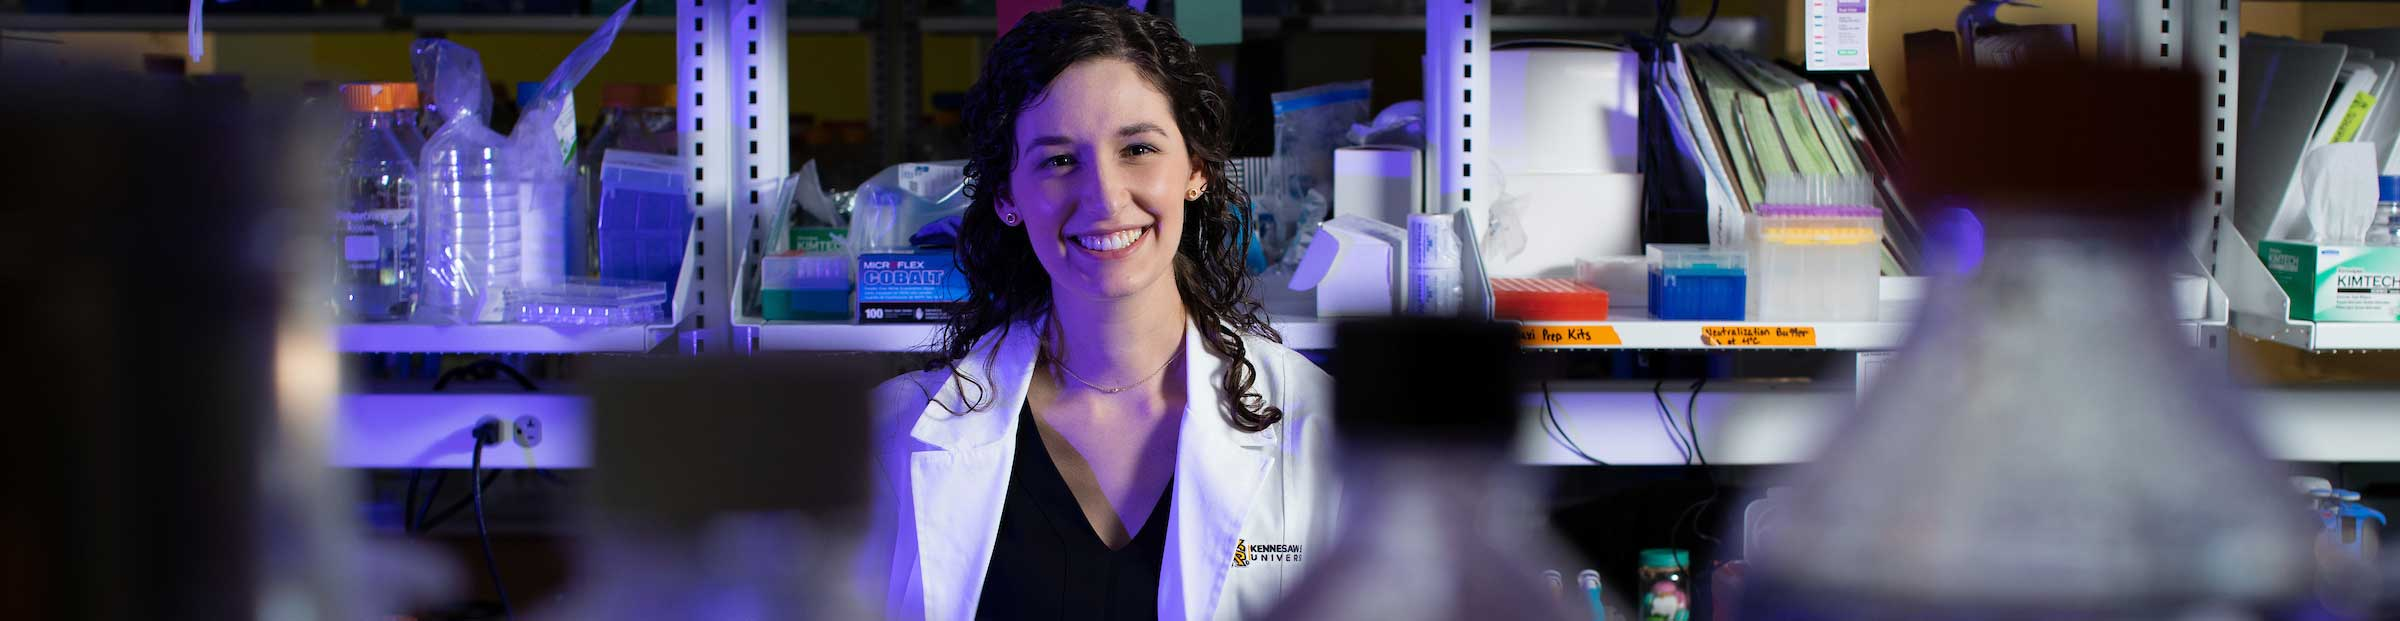 KSU graduate blends arts and science, evolves as researcher